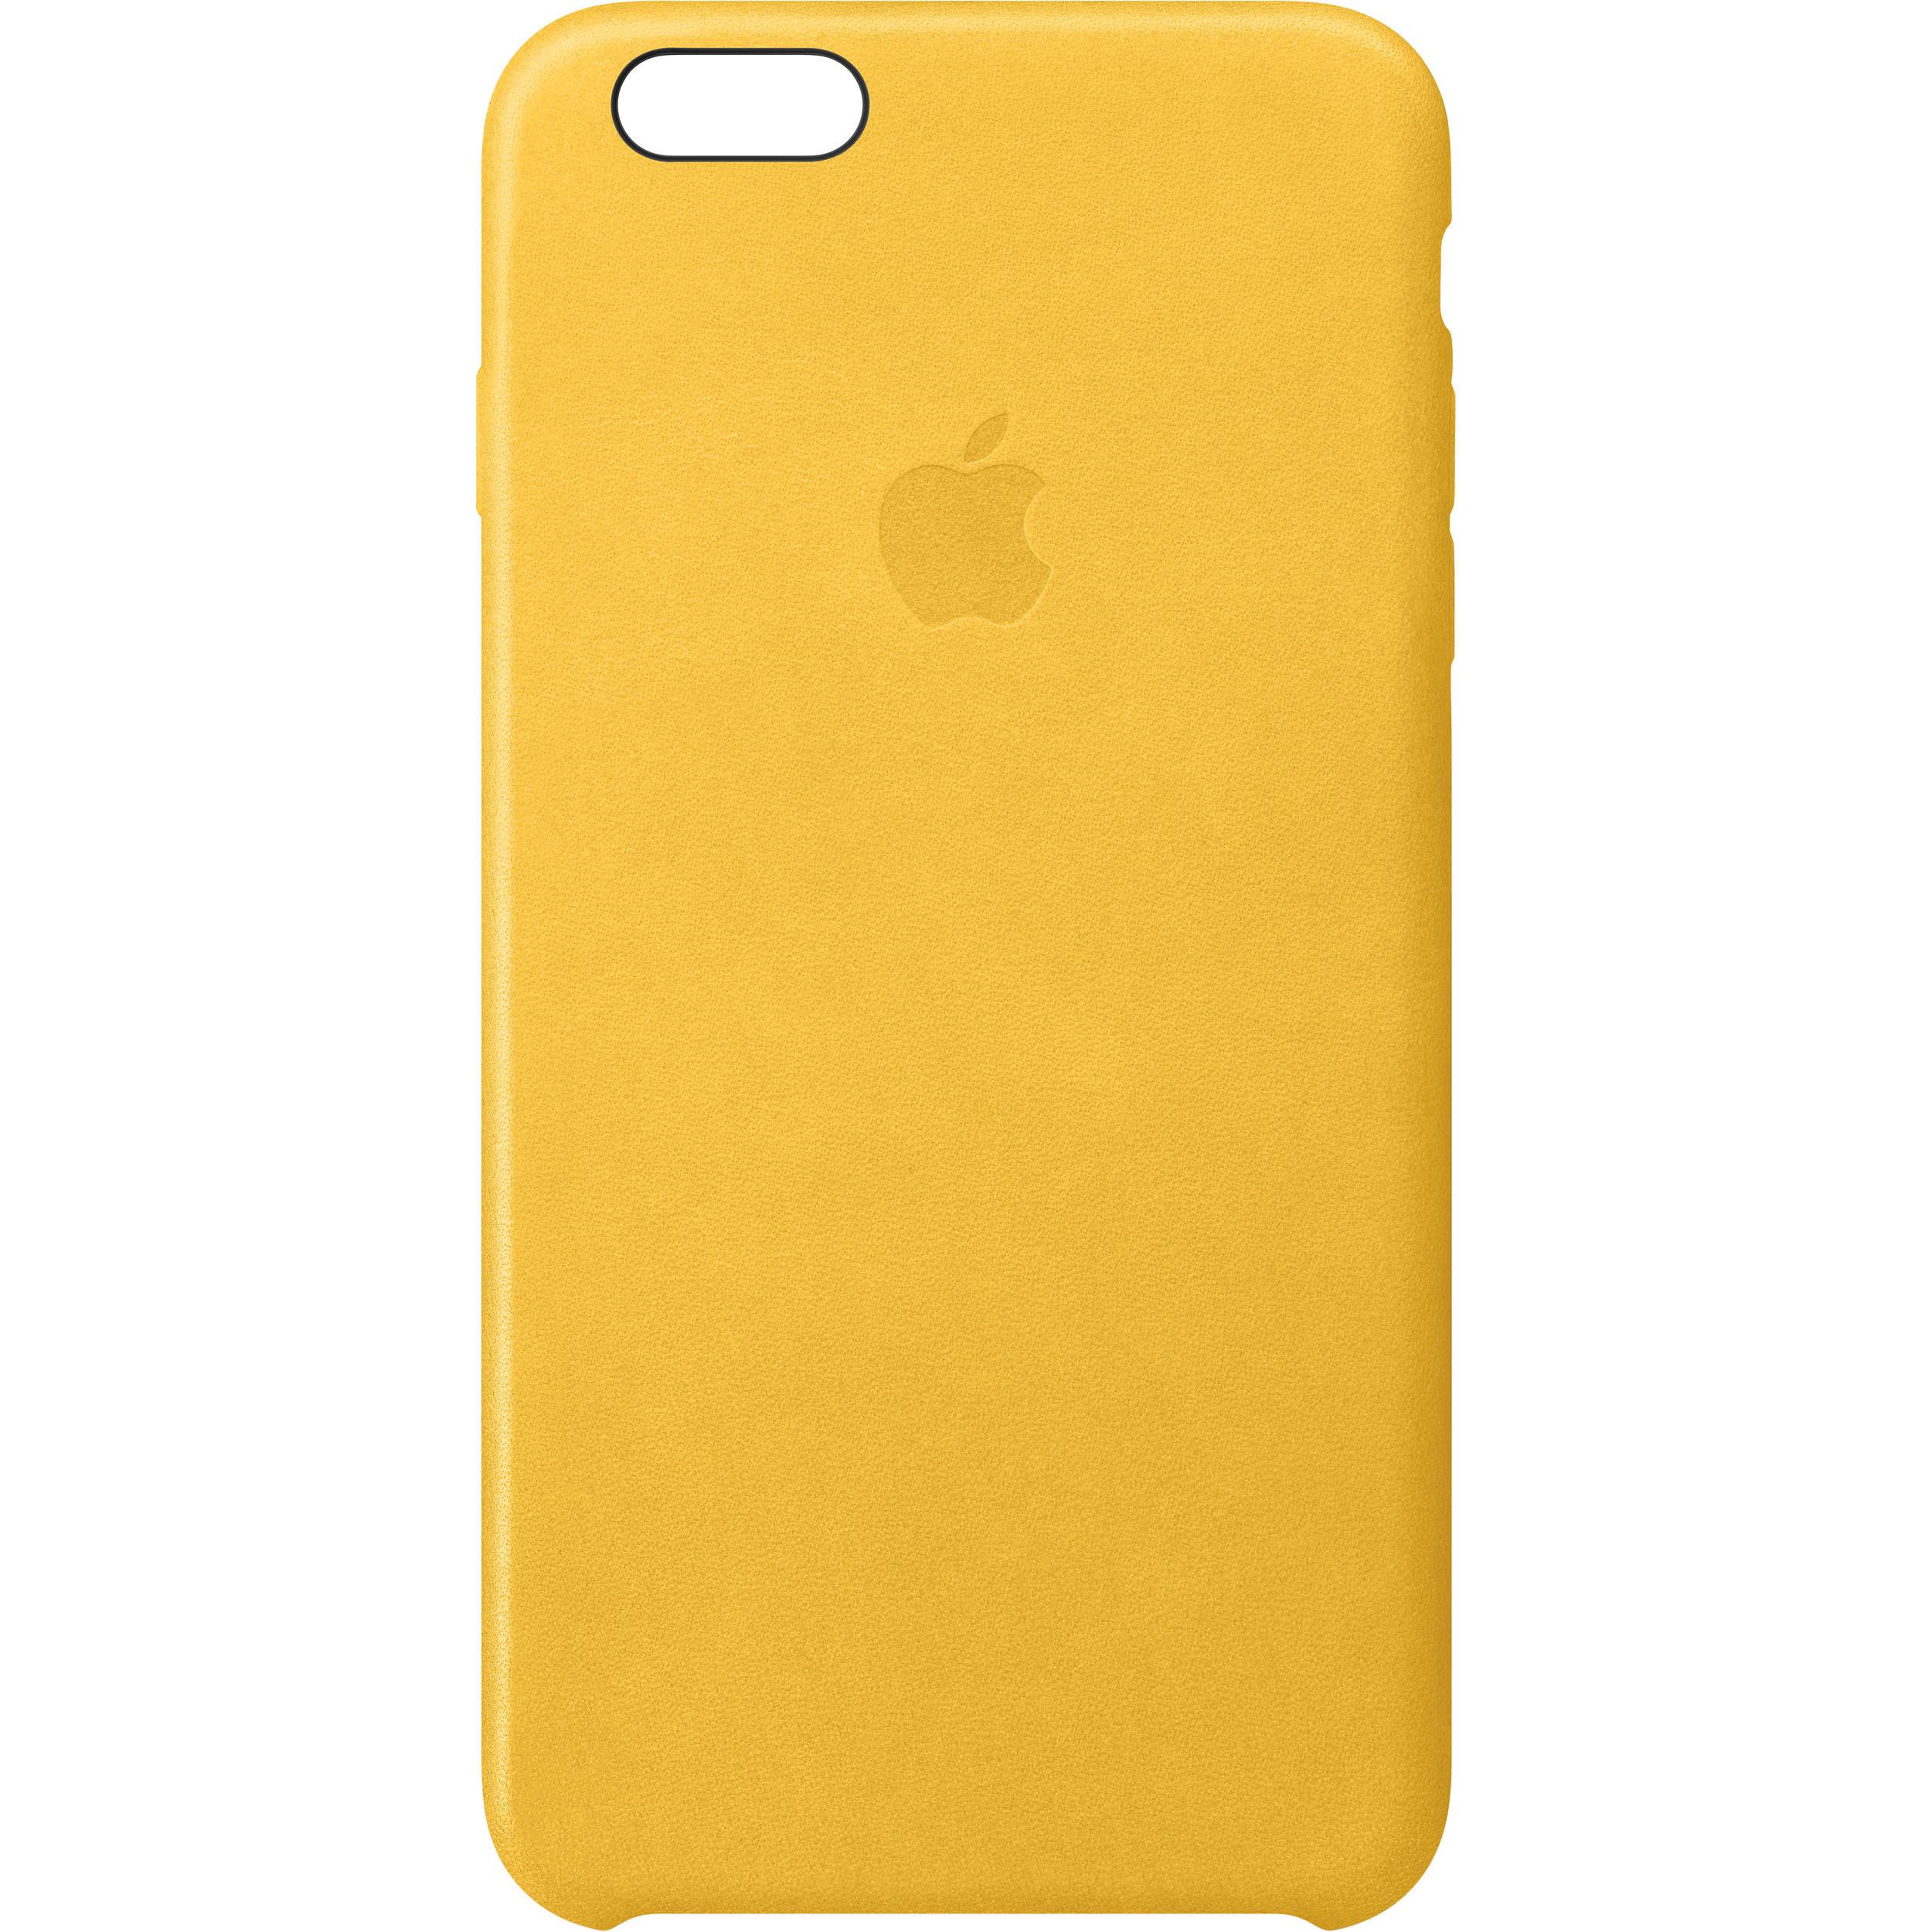 apple iphone 6plus leather case